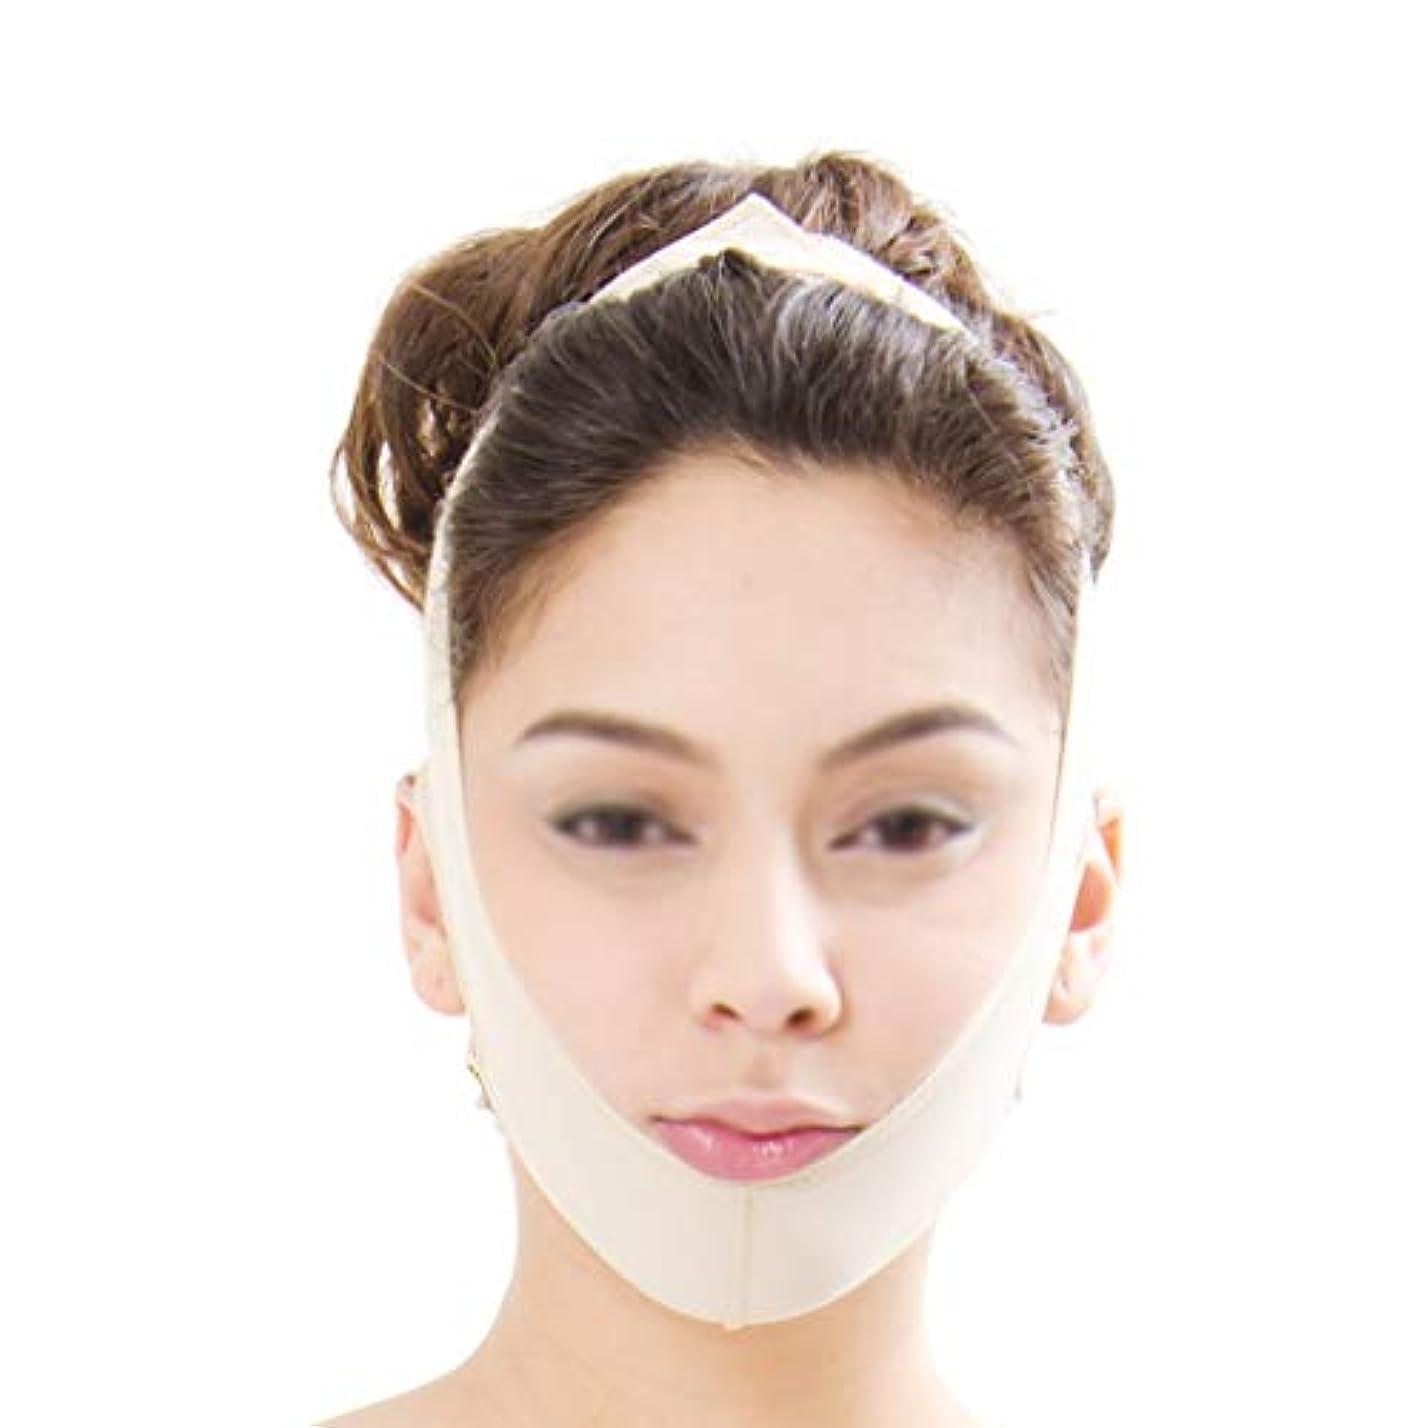 XHLMRMJ フェイススリミング包帯、フェイスリフティングマスク、フェイスリフティング包帯、フェイシャル減量マスク、ダブルチンケア減量 (Size : XXL)